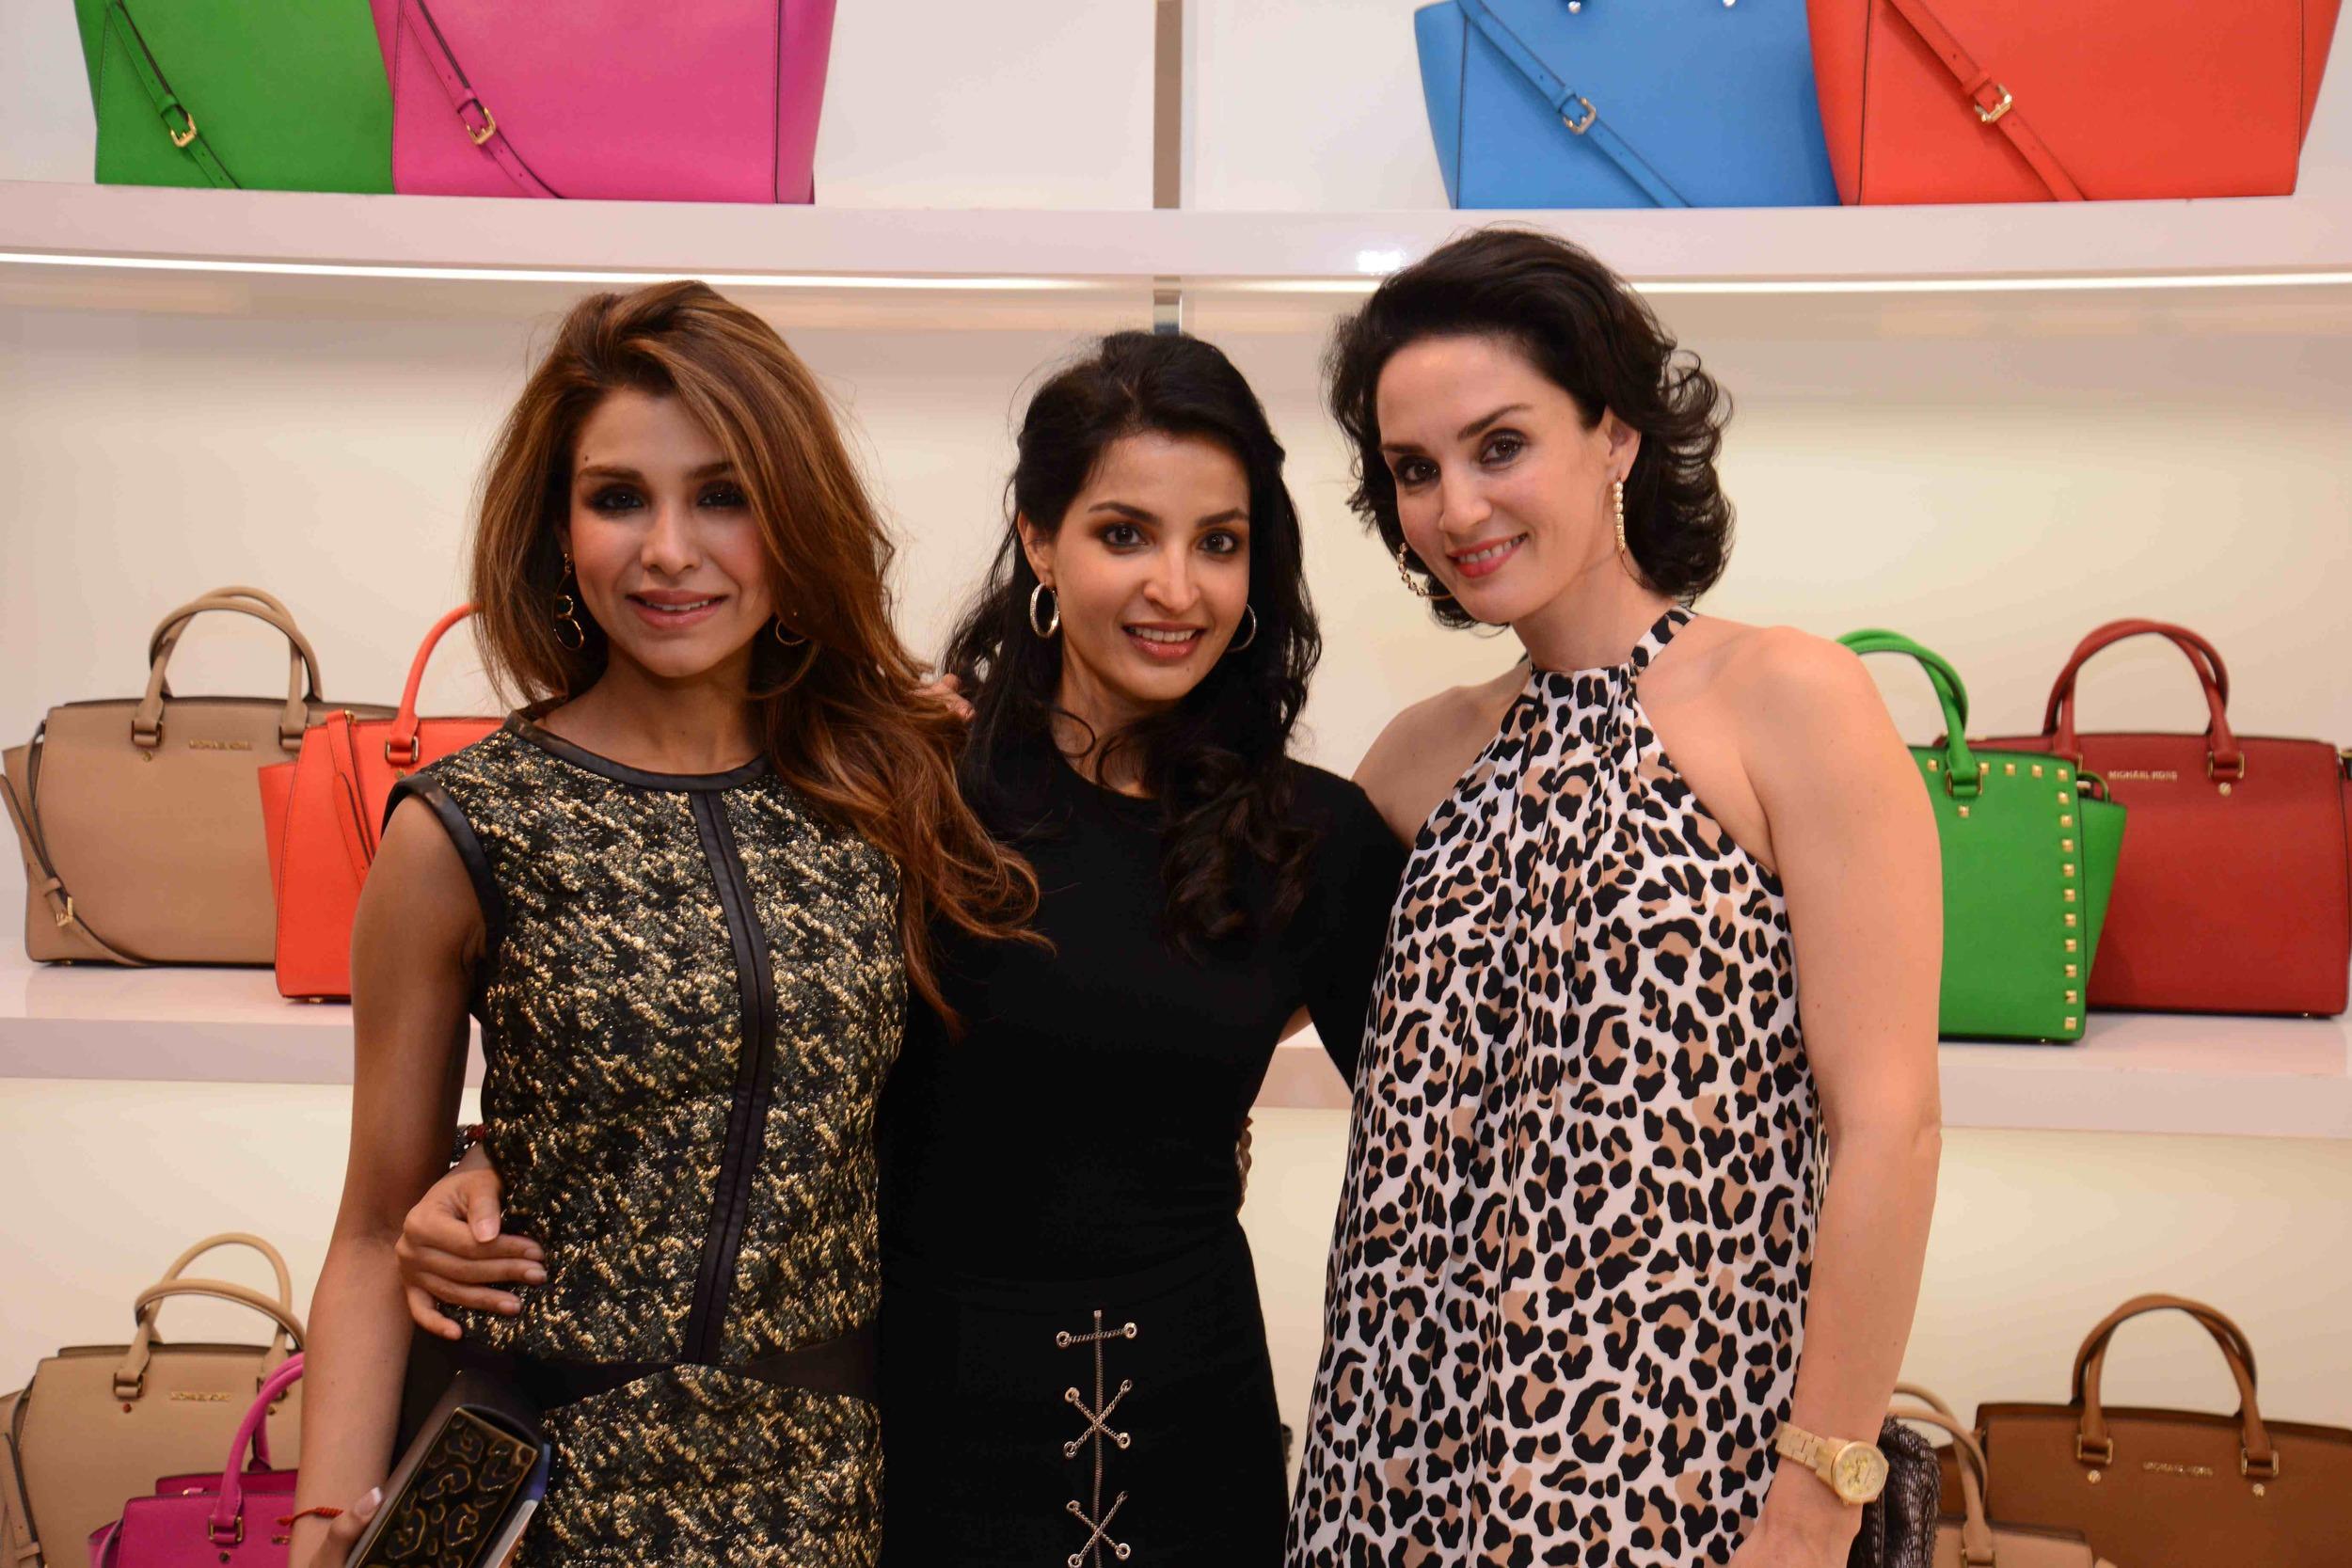 Niamat Bakshi, Sumaya Dalmia and Sonya Jehan